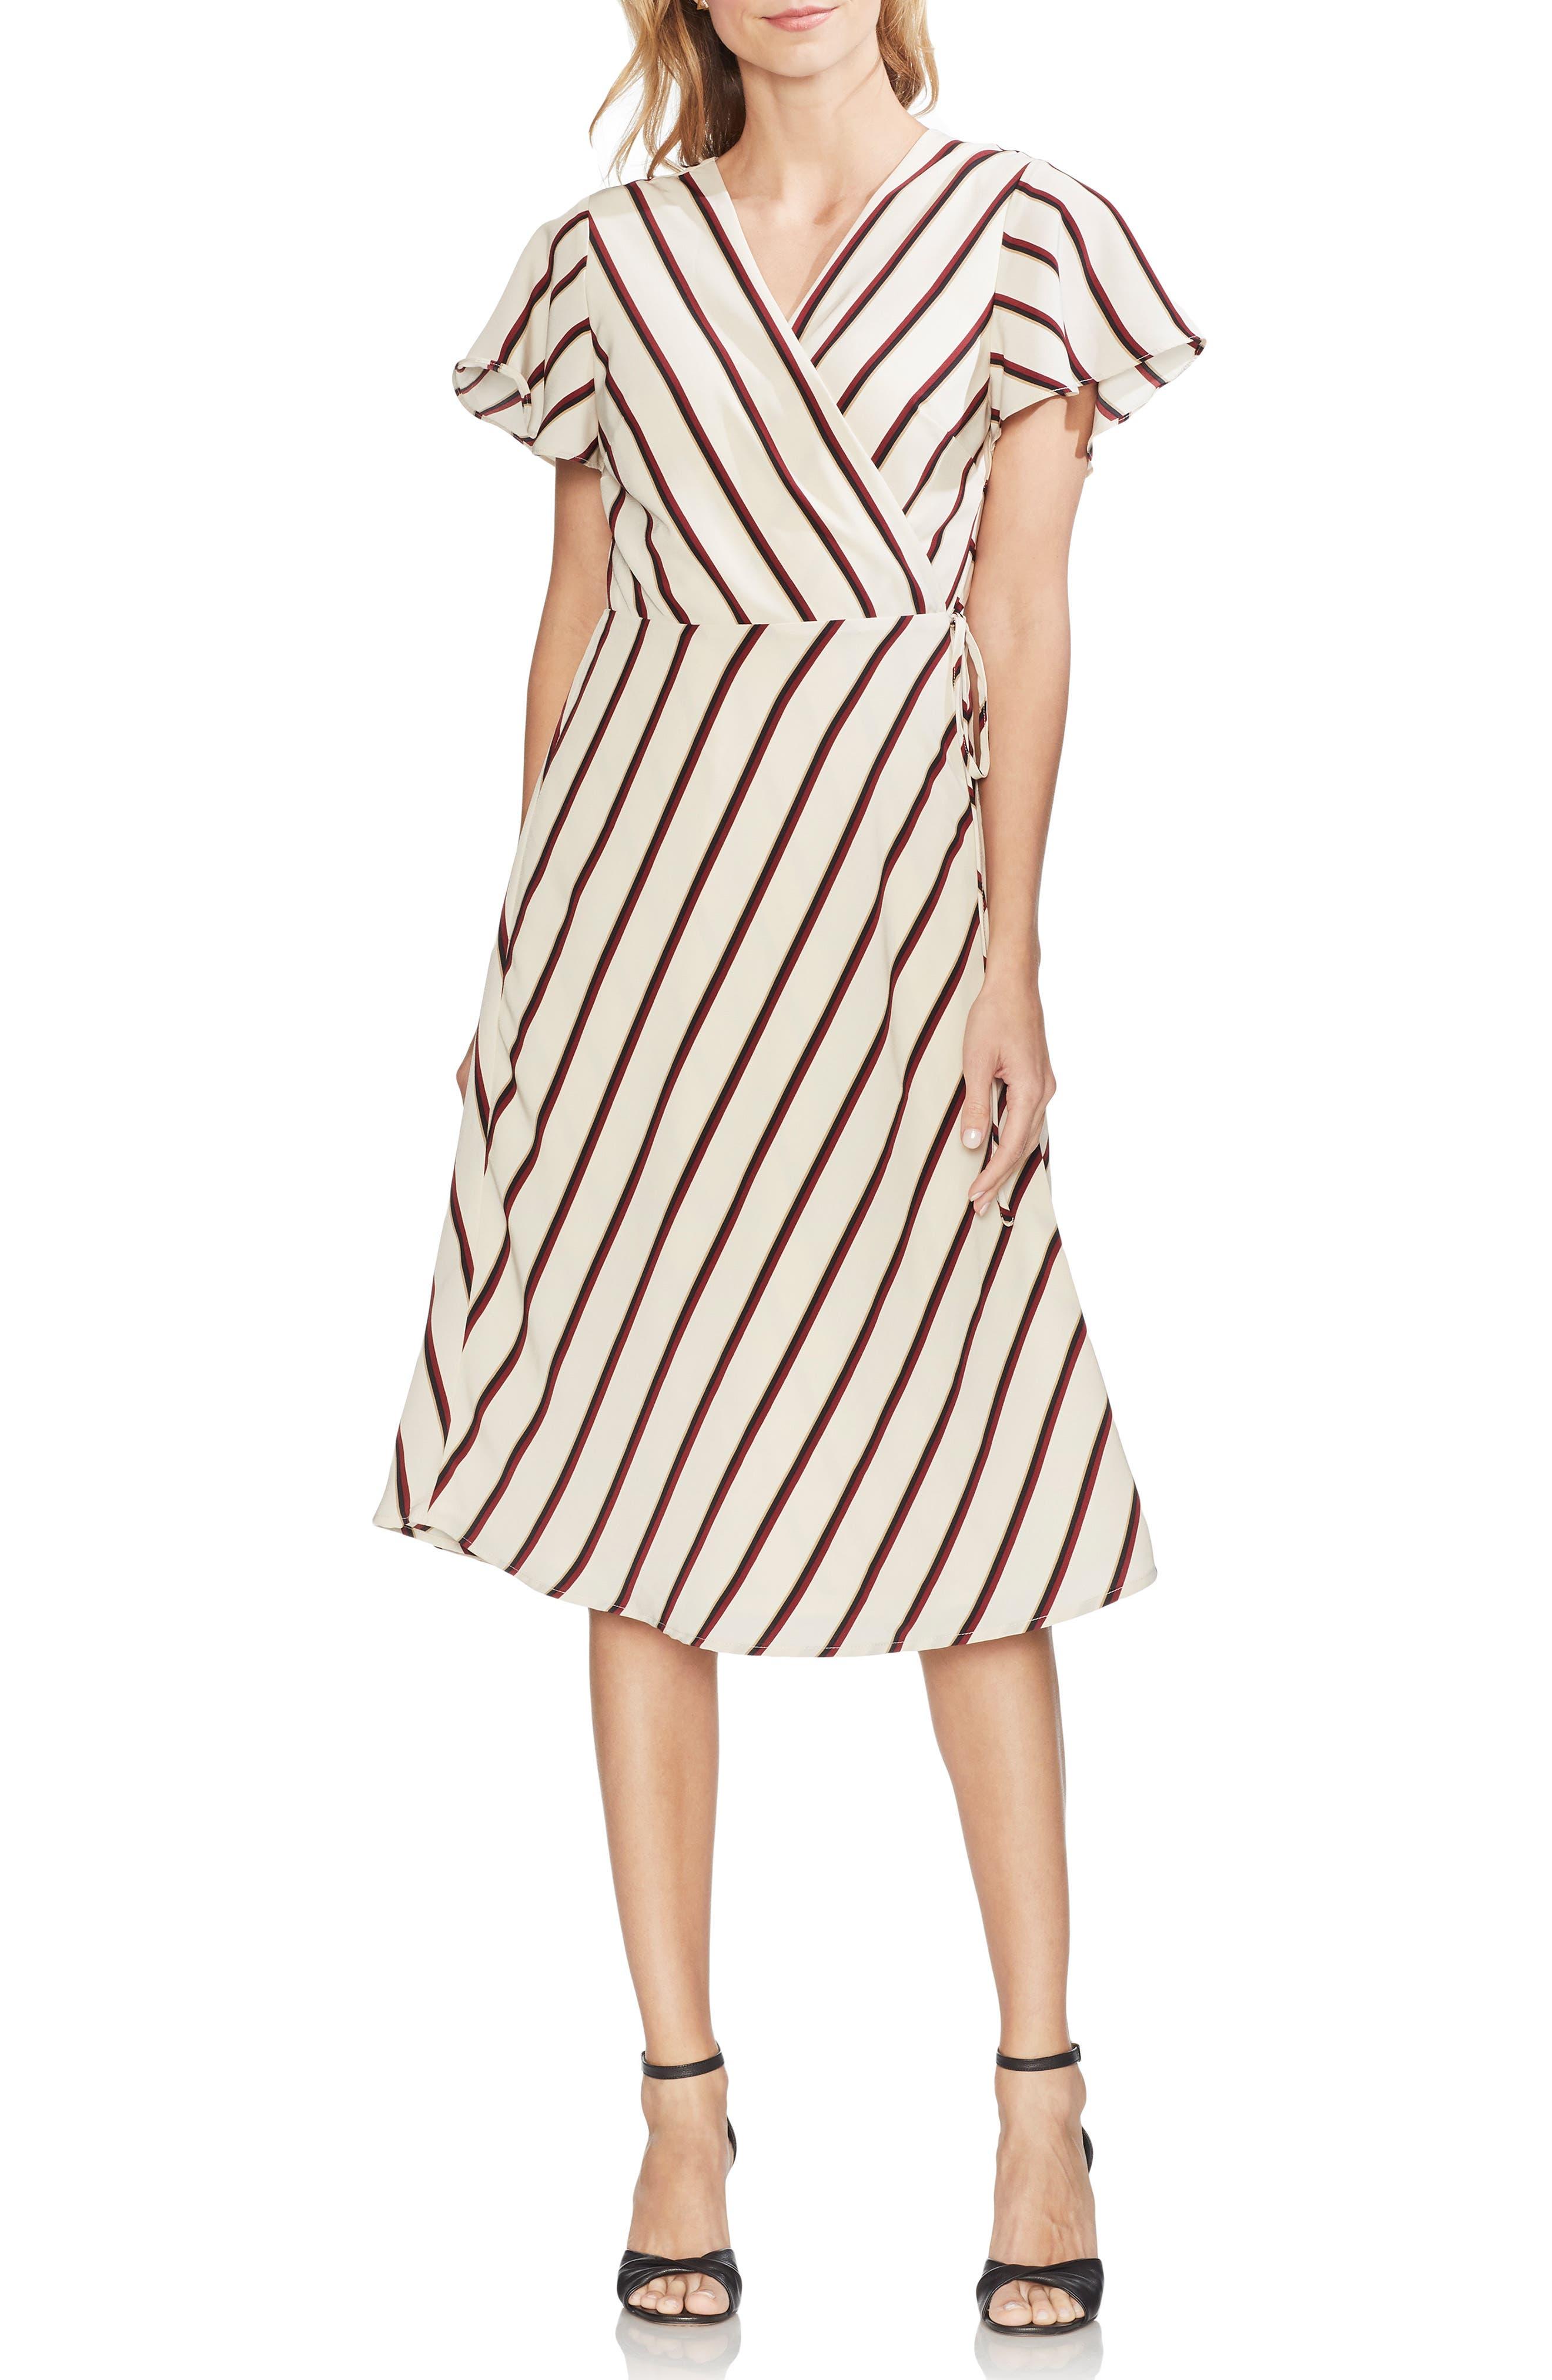 Vince Camuto Caravan Stripe Wrap Dress, Beige